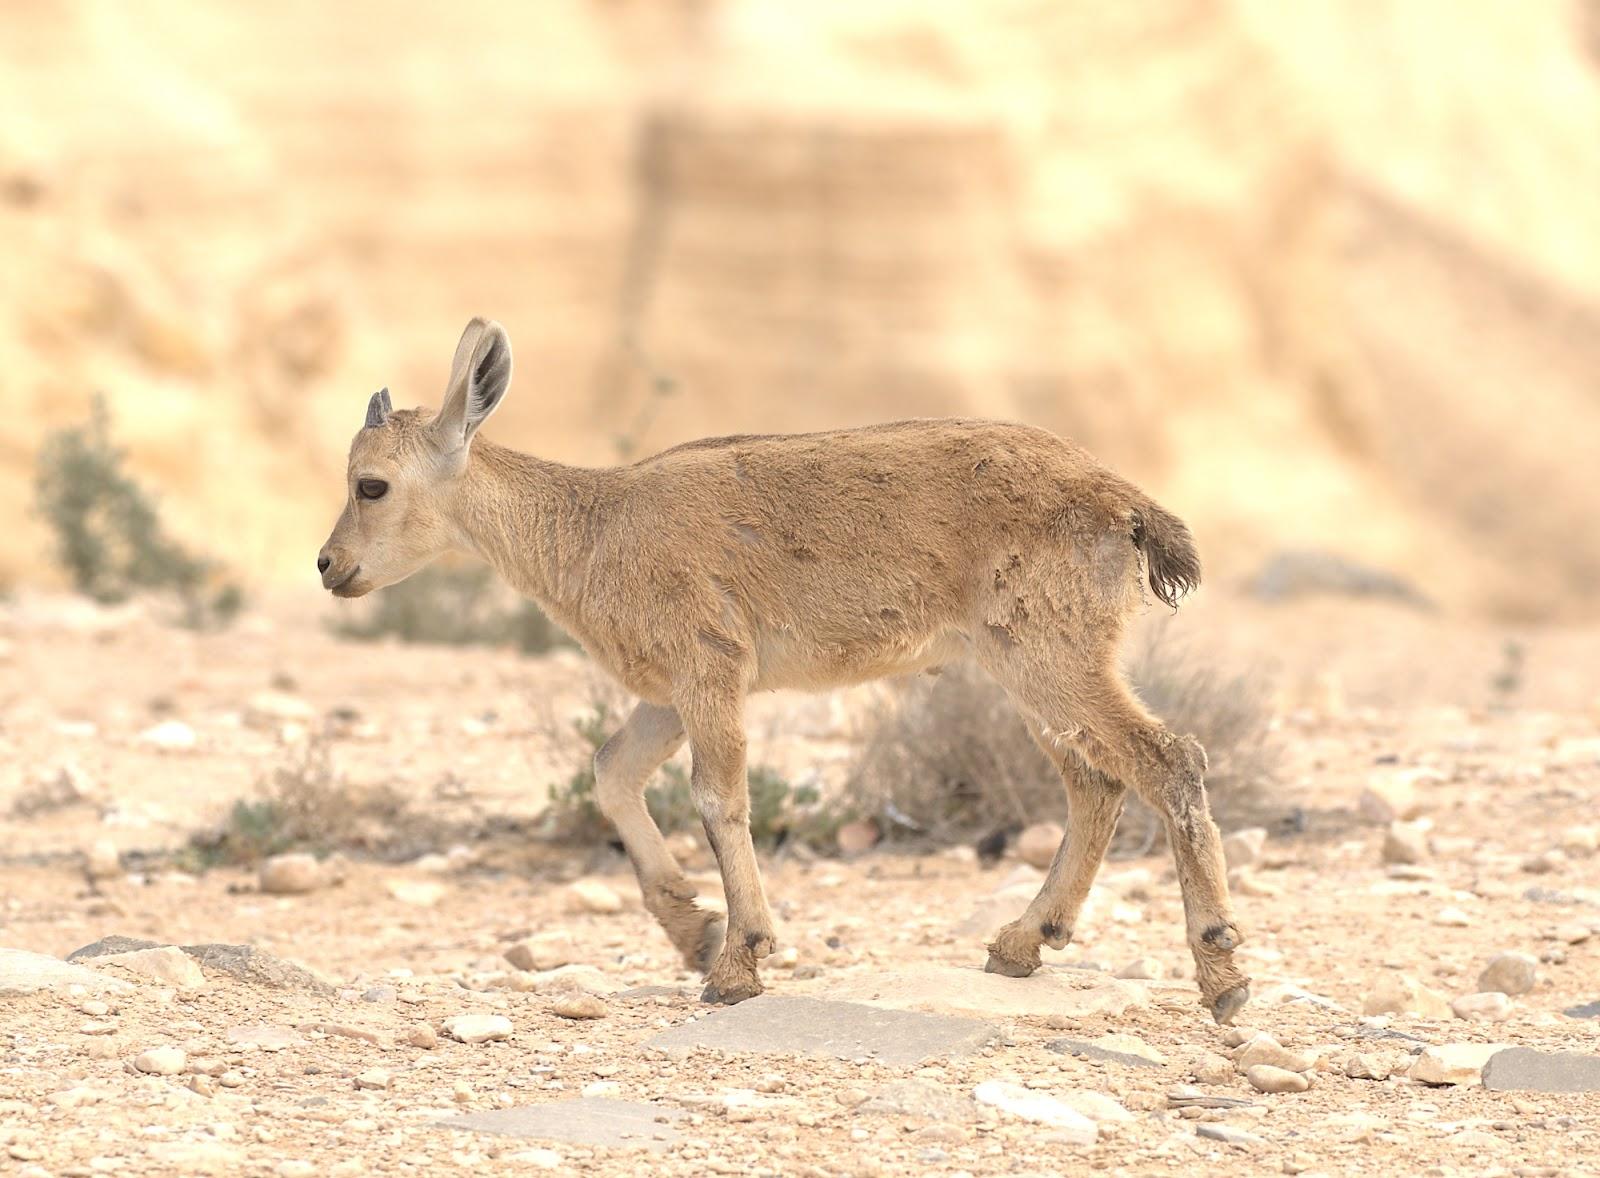 Nubian ibex young_rsz.jpg